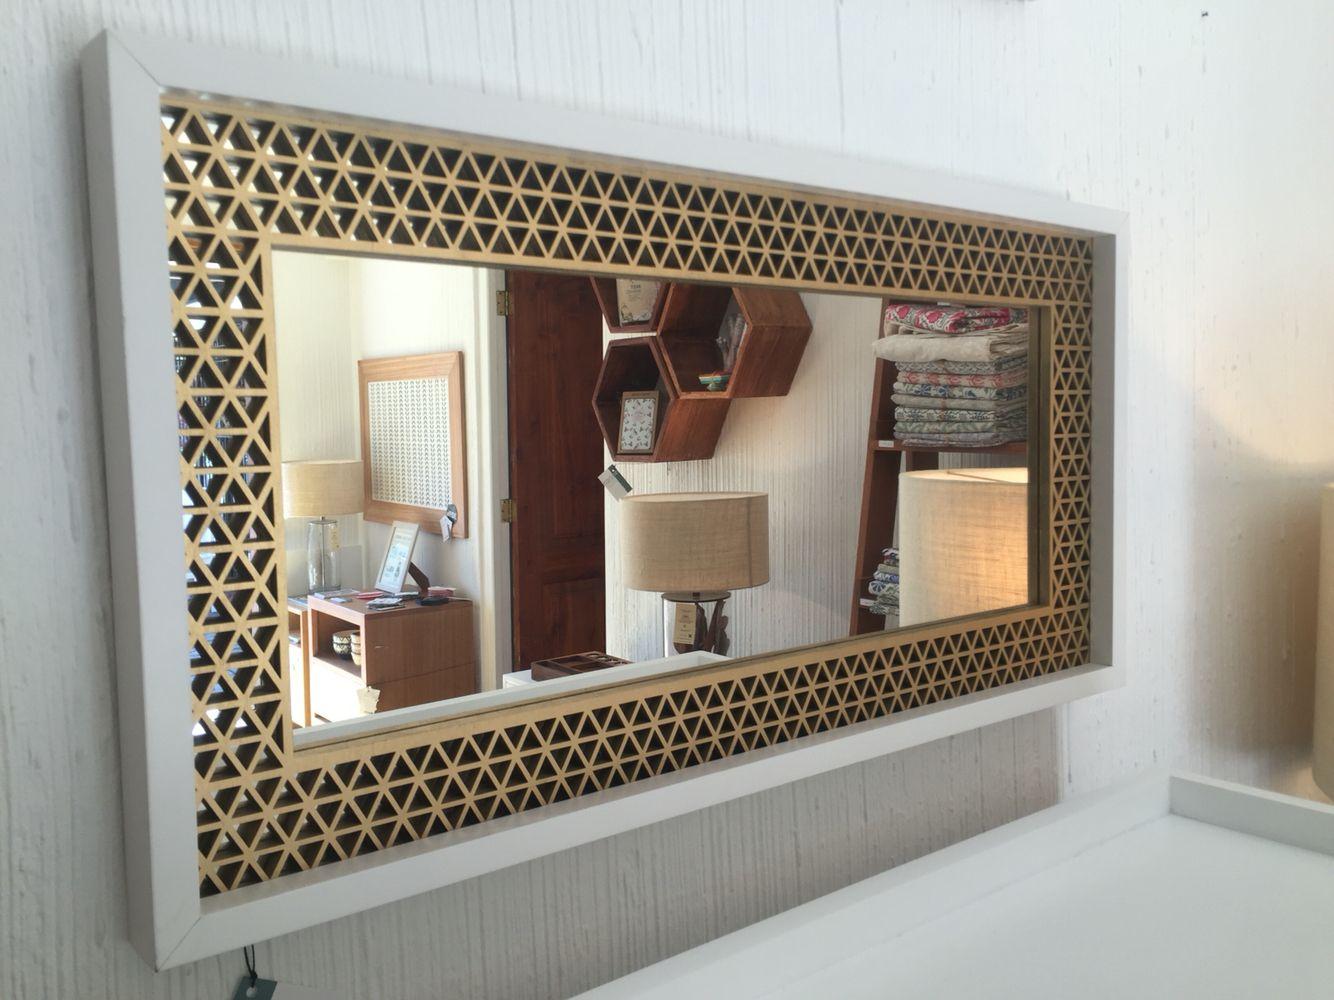 Pindelínea Diseños On Objetos  Pinterest Fair Decorative Mirrors Dining Room Inspiration Design